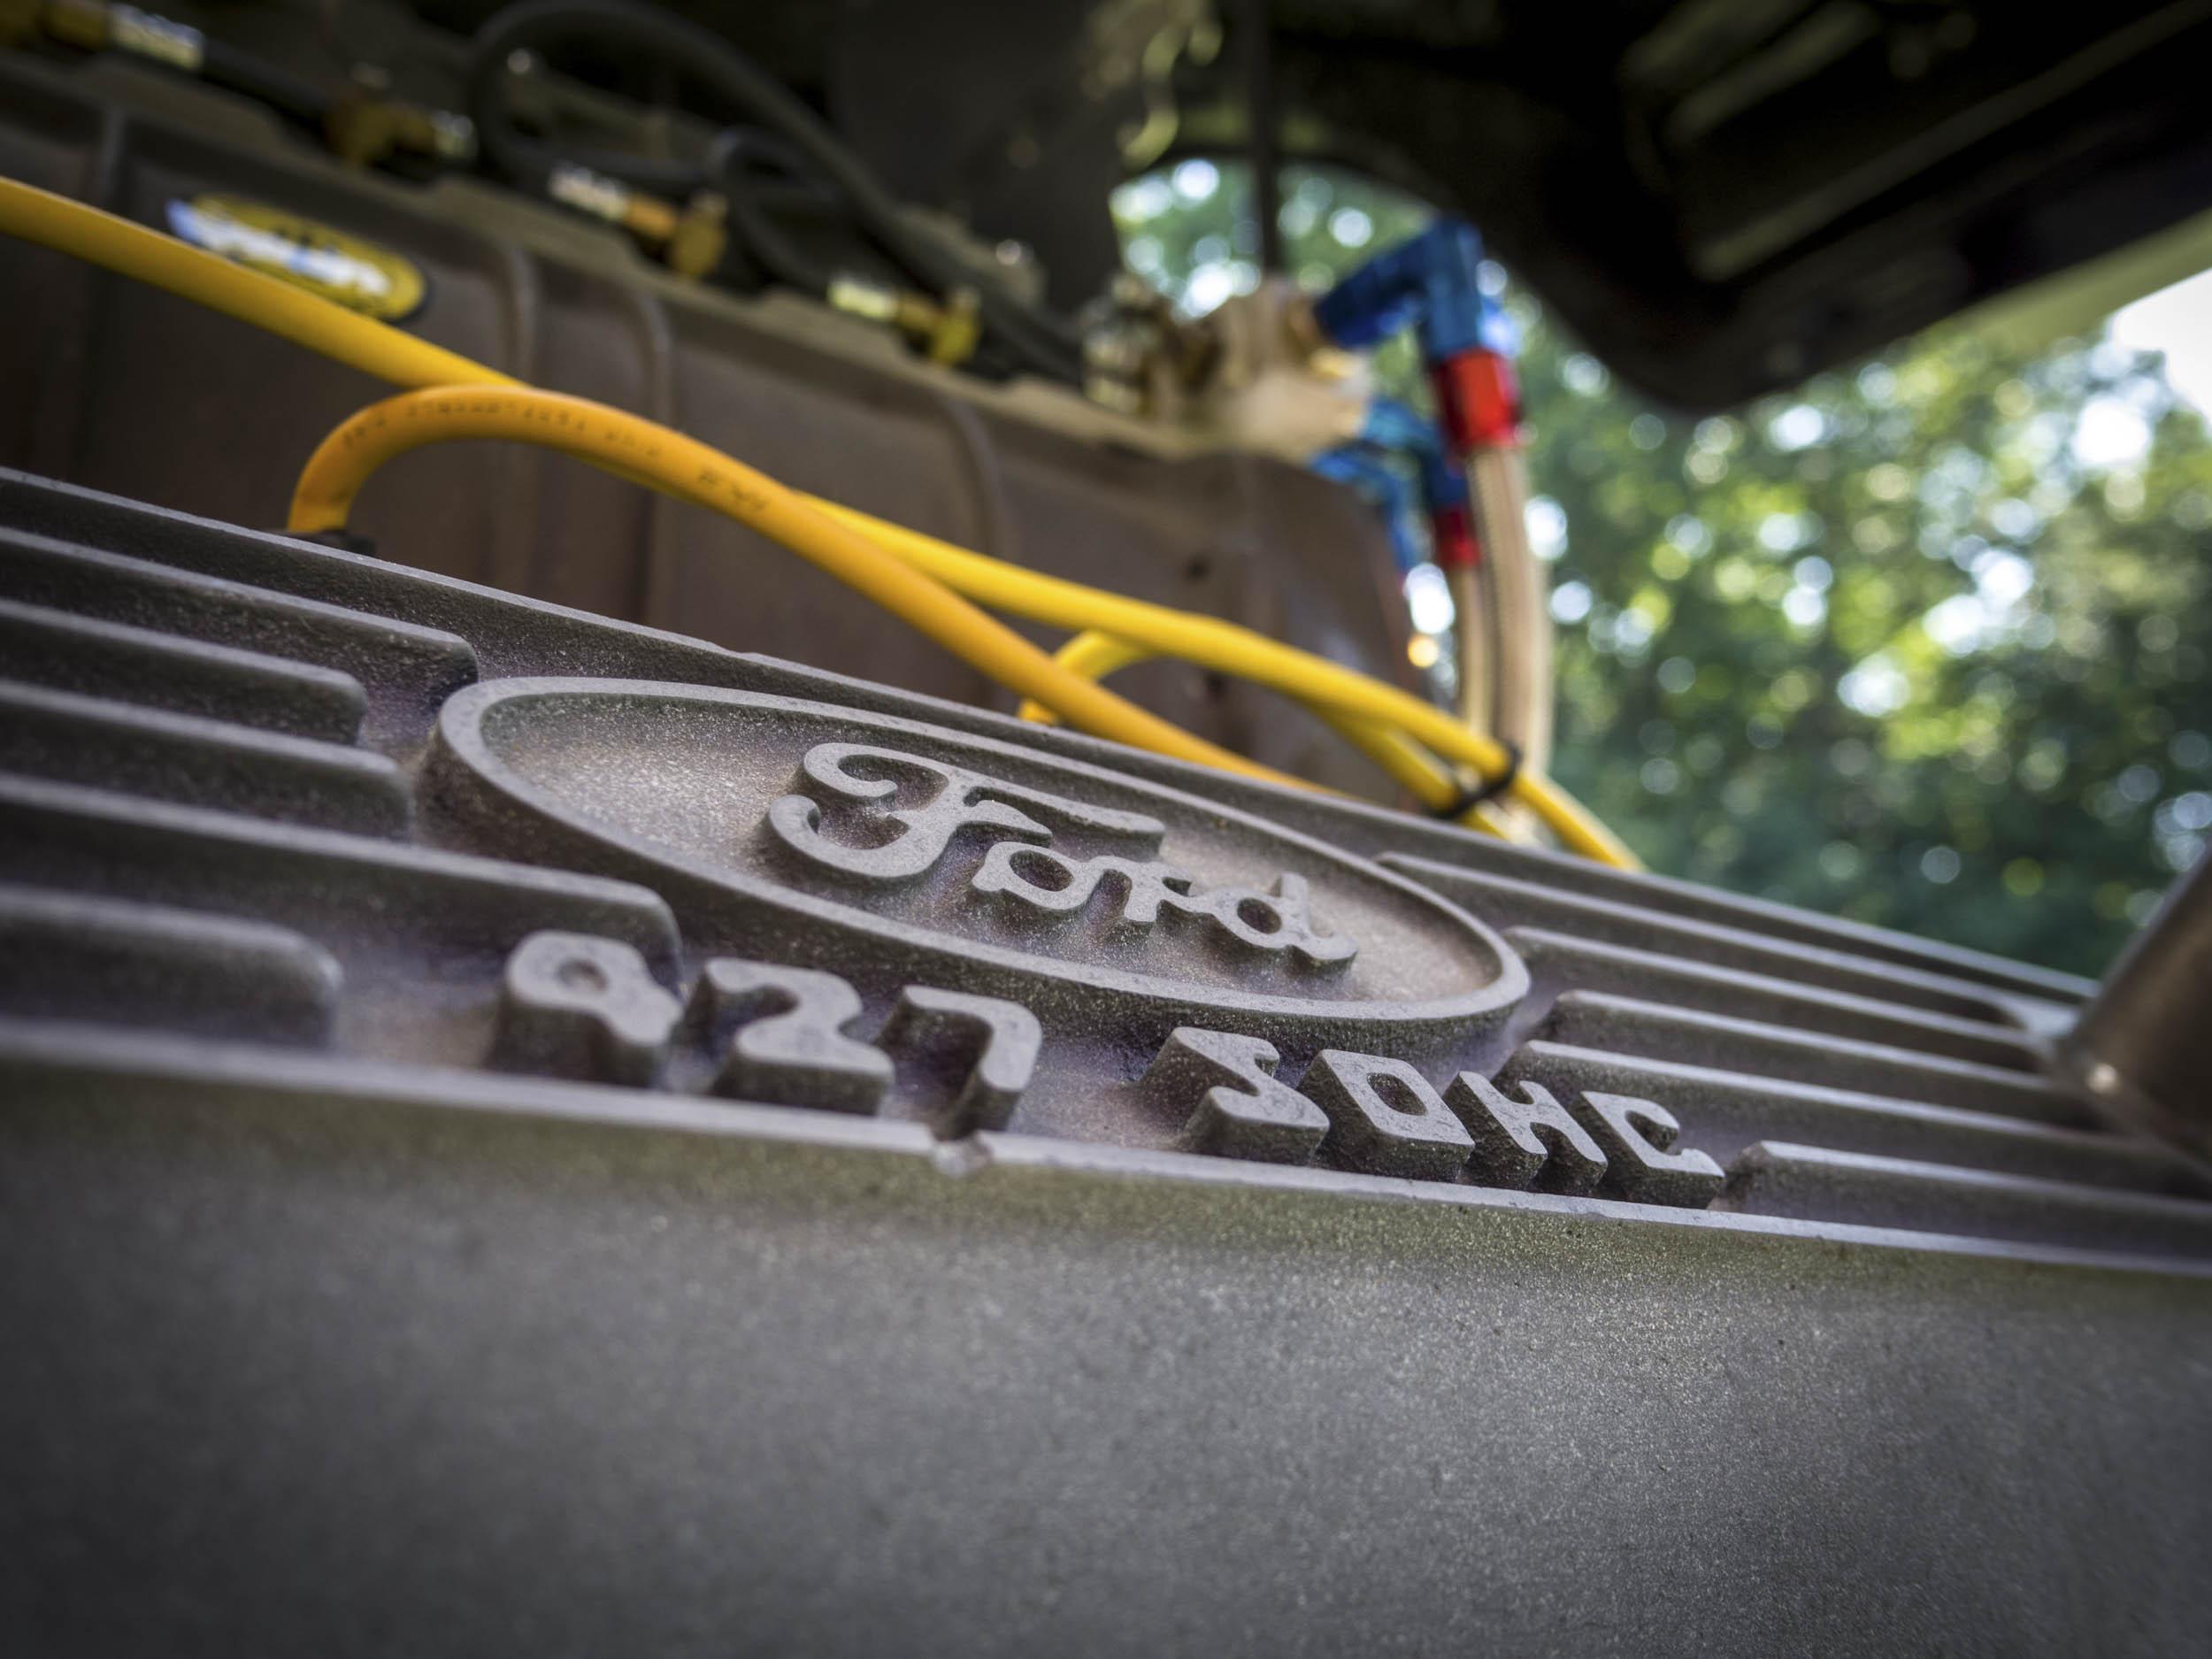 Ford 427 drag engine